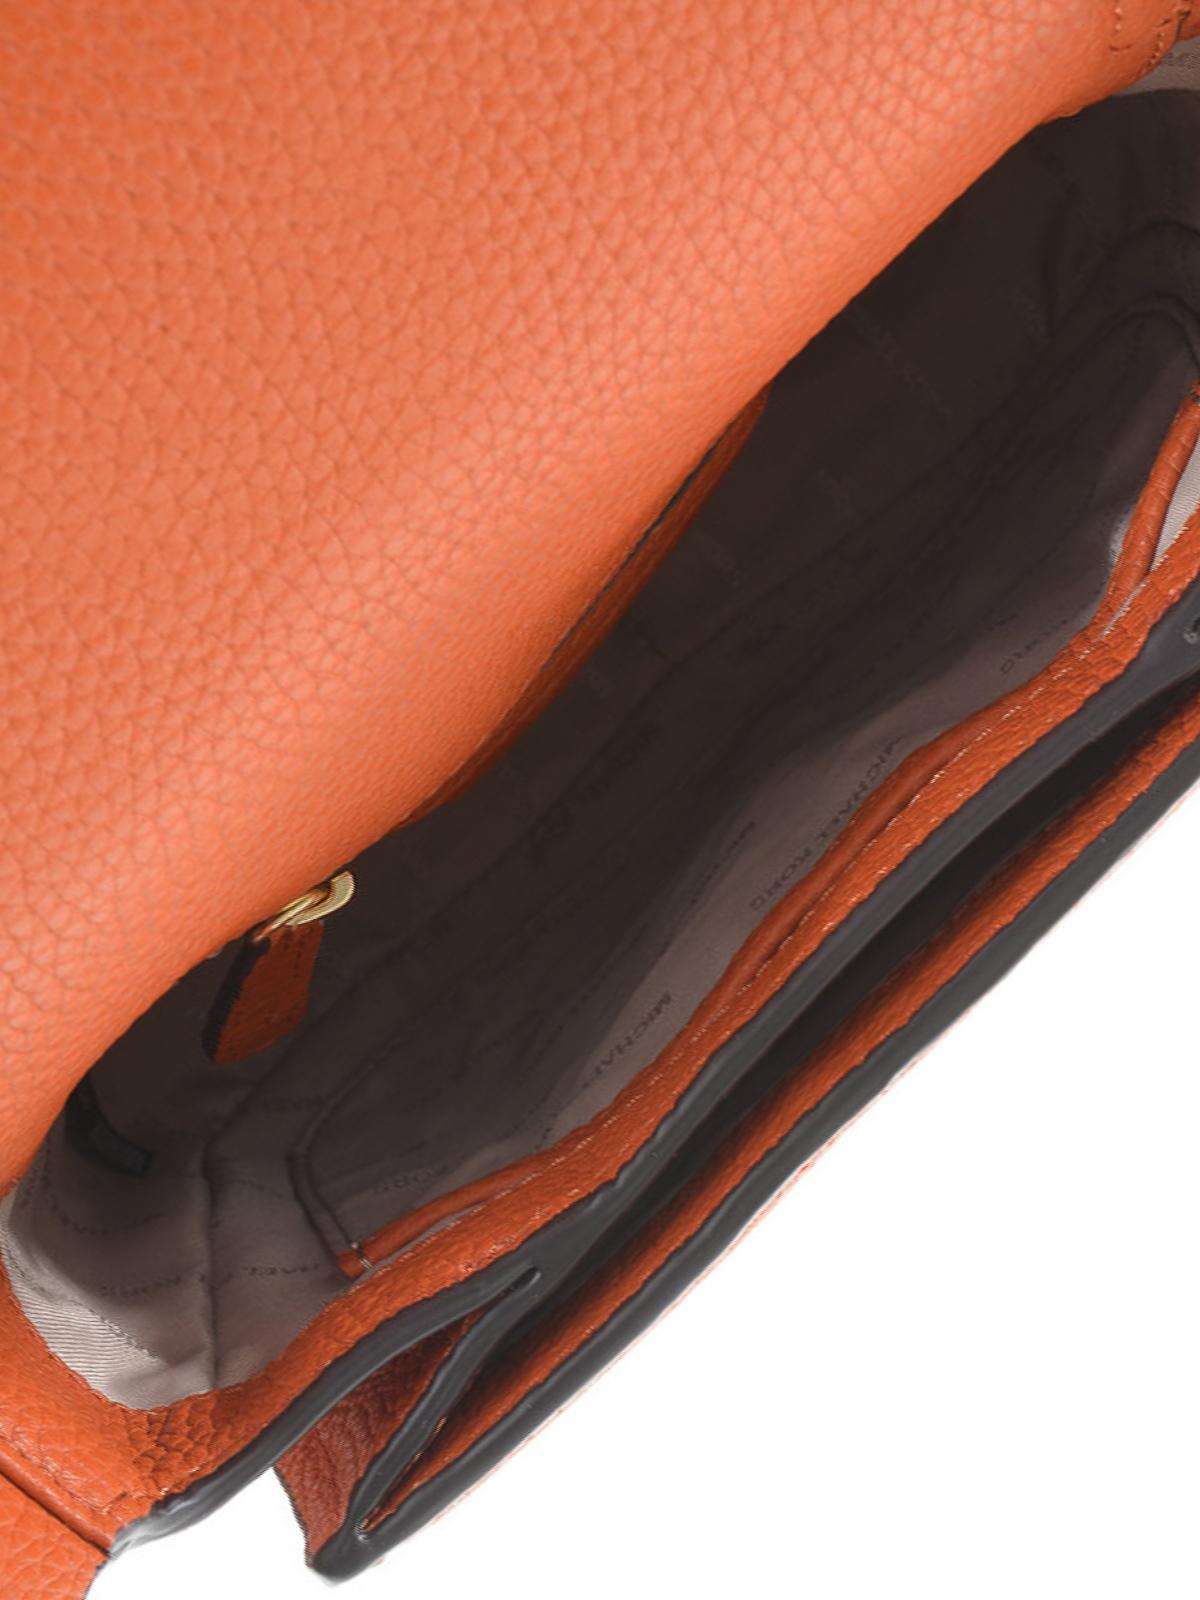 7a48e621fdc0 Michael Kors - Borsa a bandoliera Maxine - borse a tracolla ...